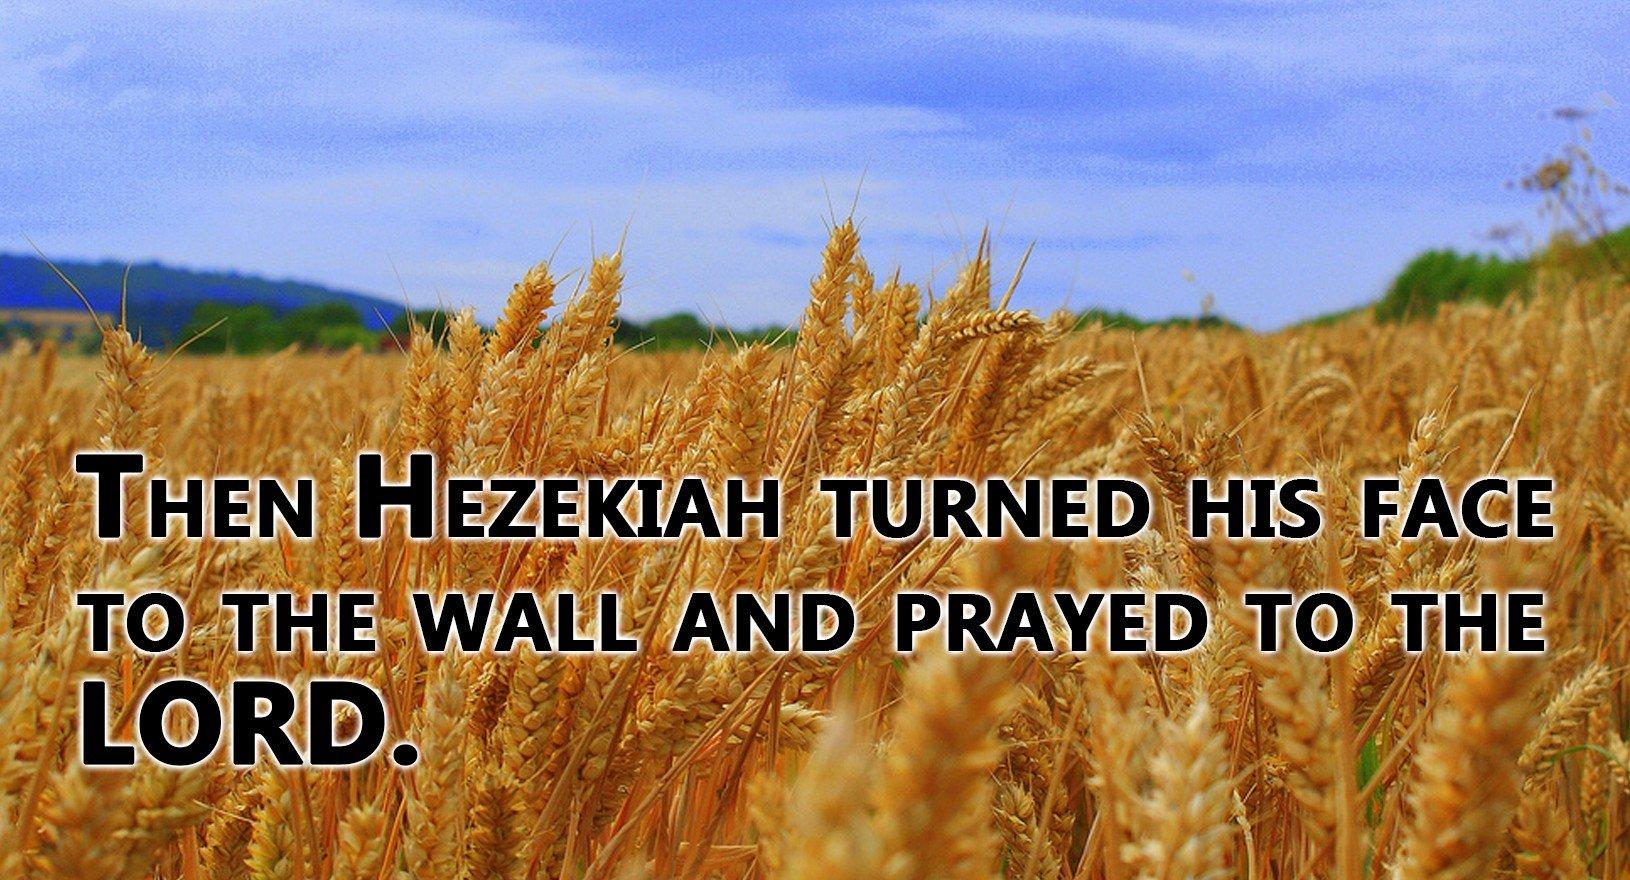 Isaiah 38